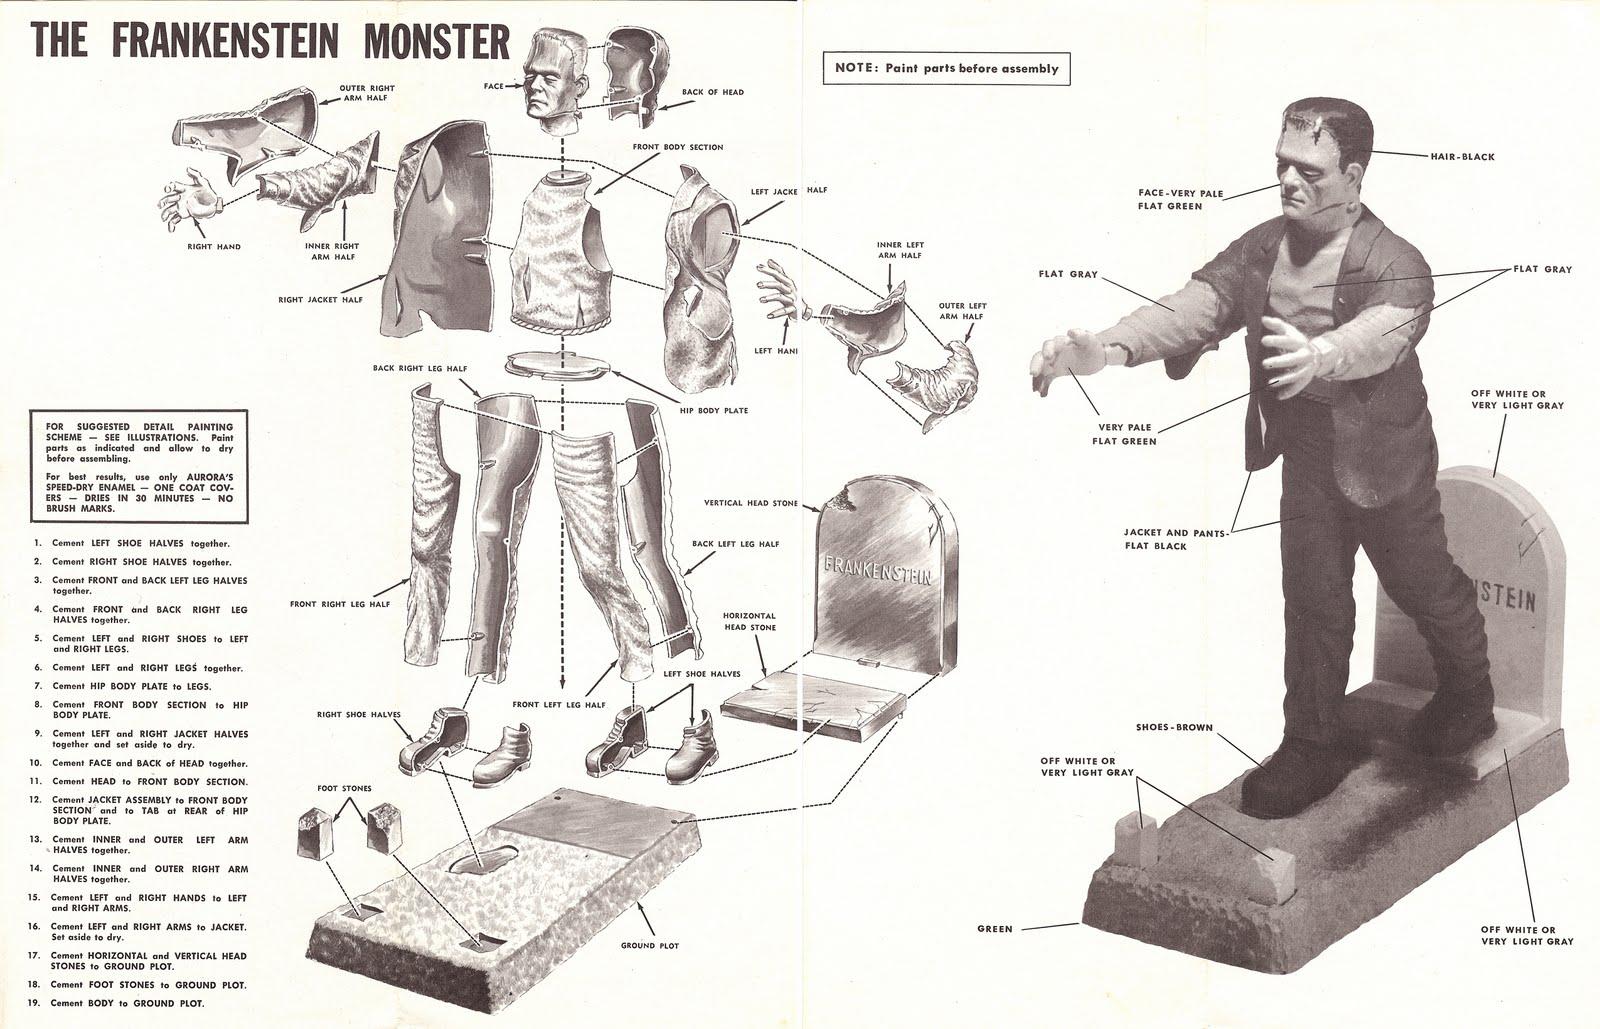 compare contrast essay frankenstein monster